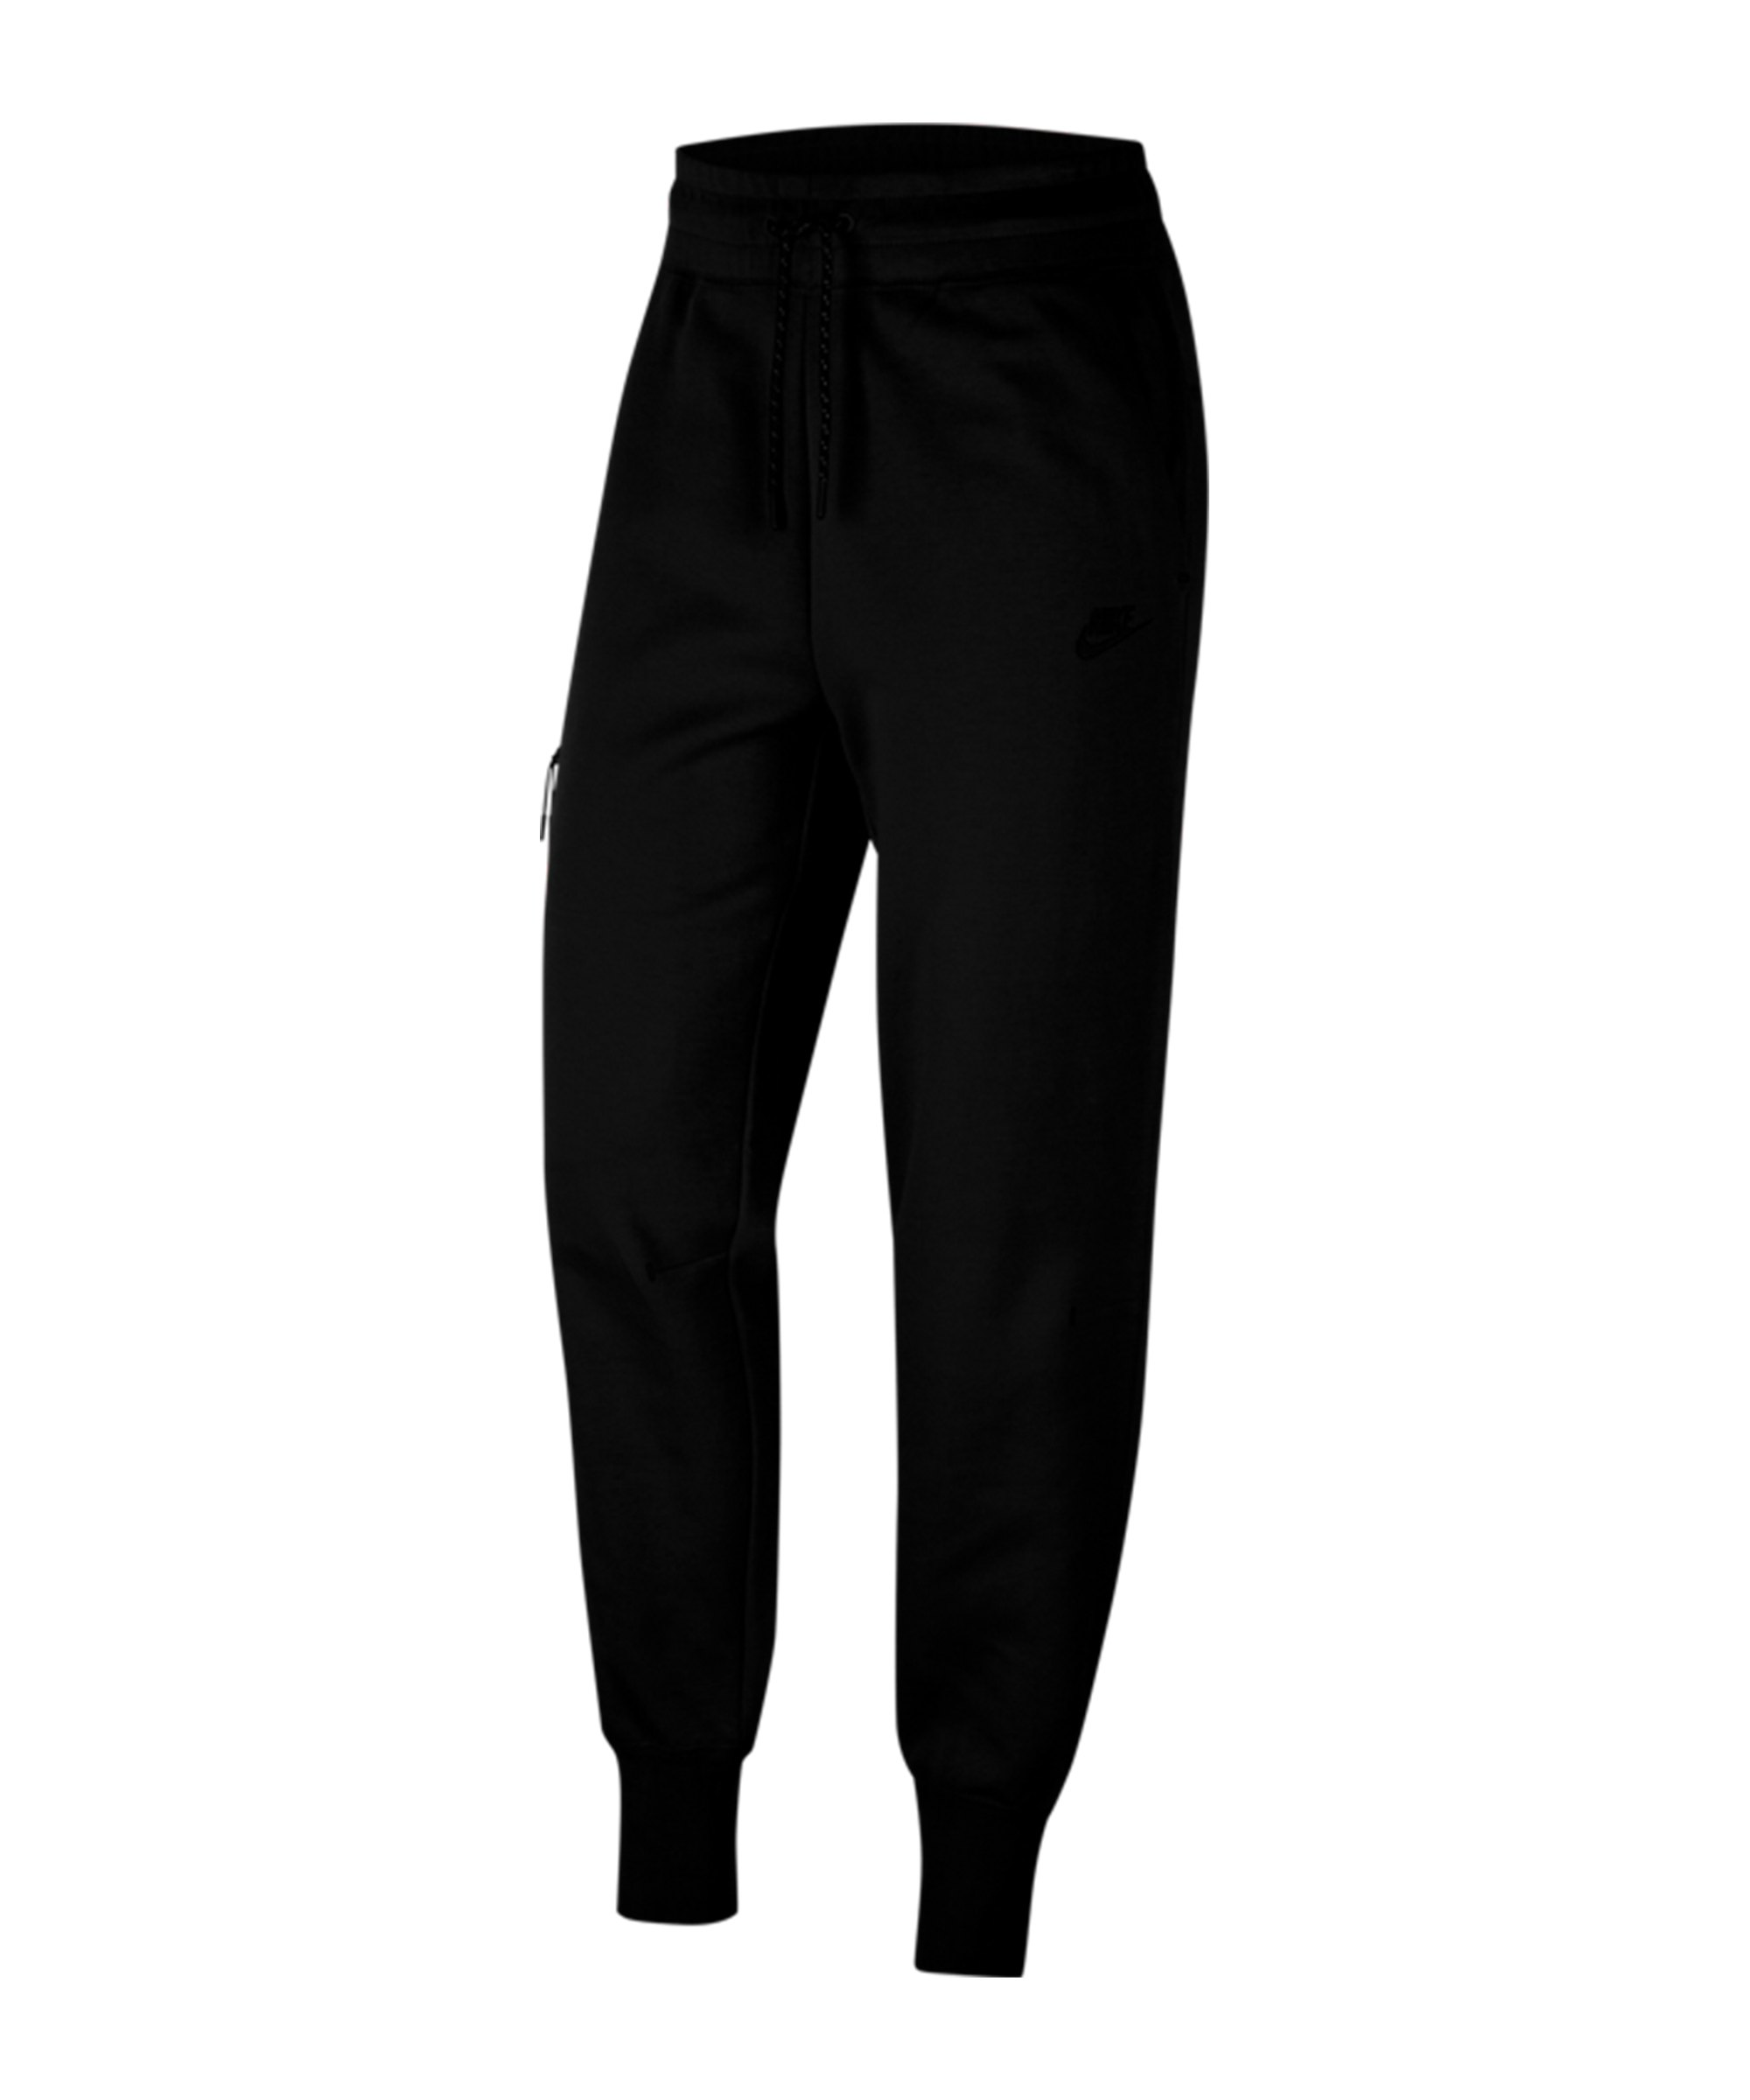 Nike Tech Fleece Jogginghose Damen Schwarz F010 - schwarz